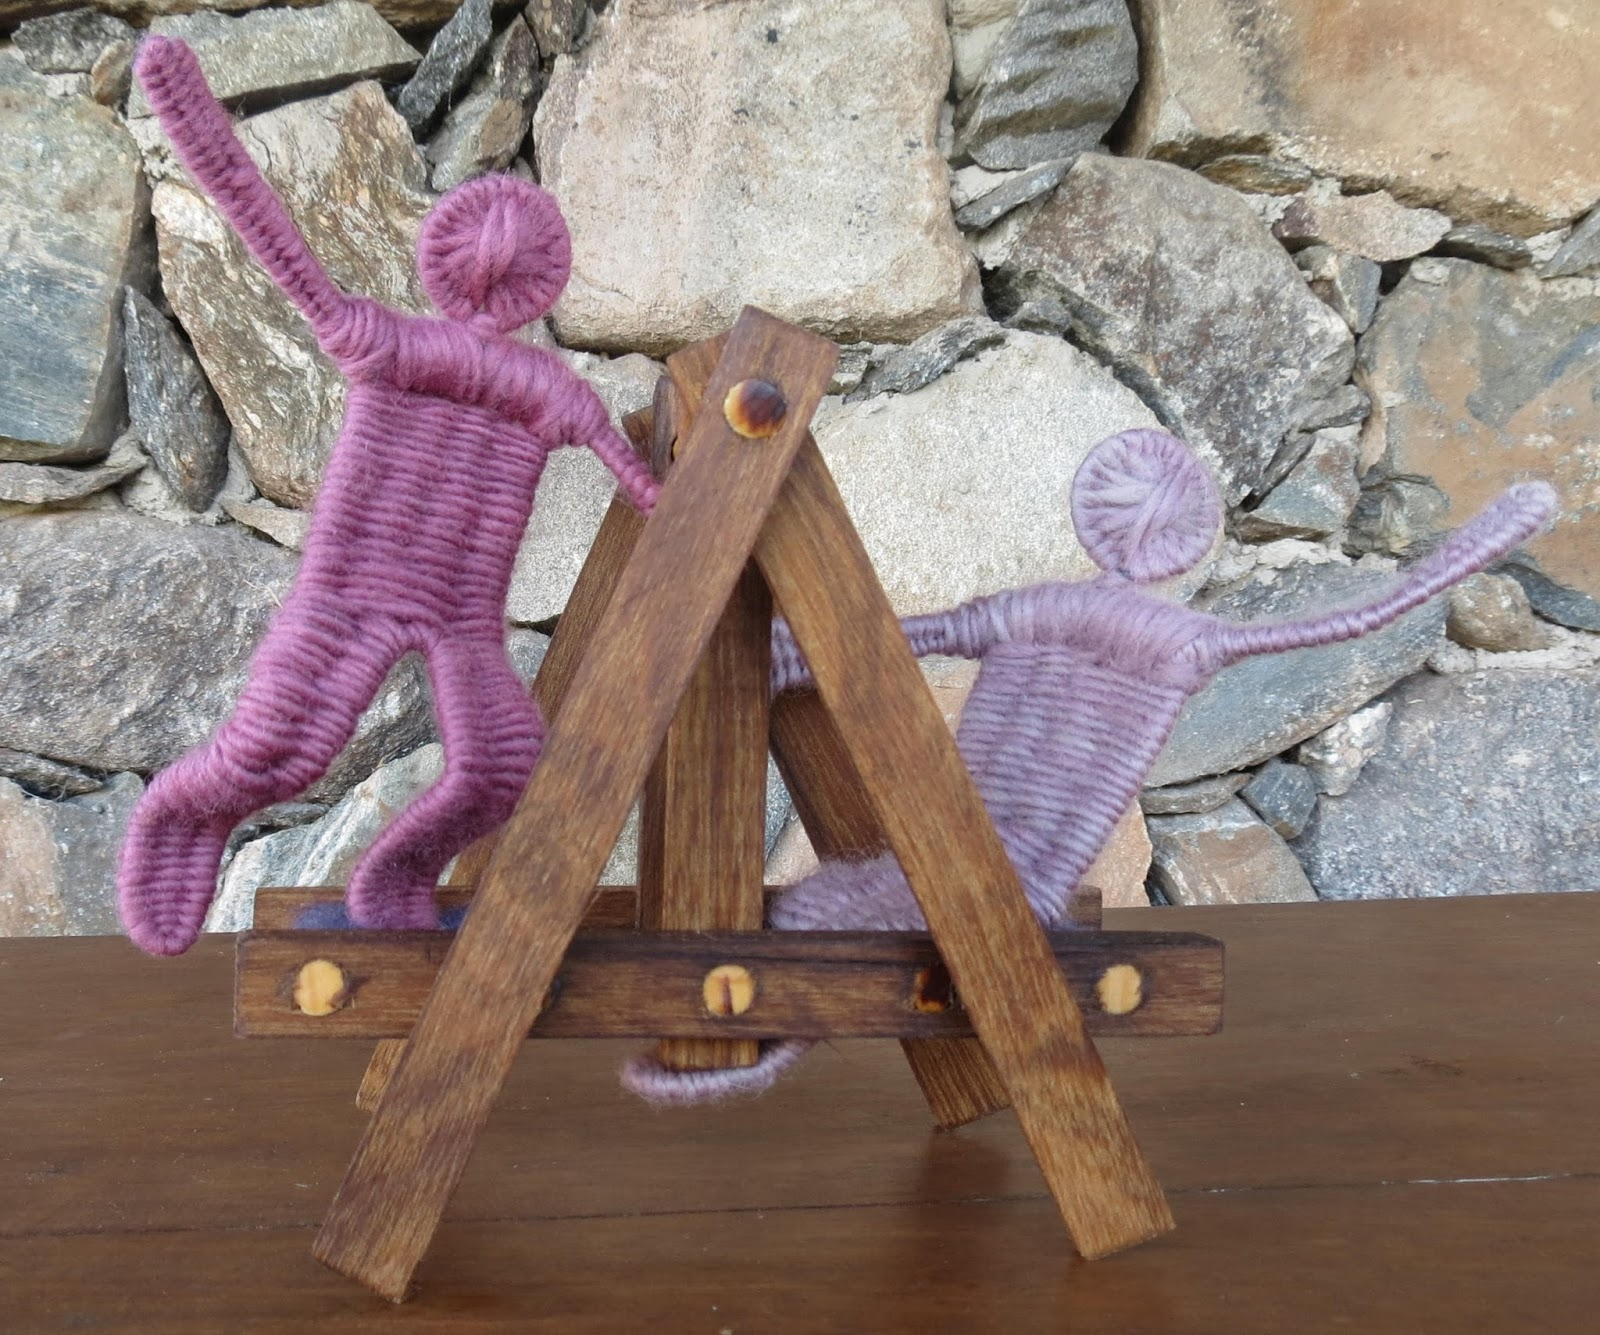 Churrinche san javier lanacr ba tas - Tinte para madera casero ...